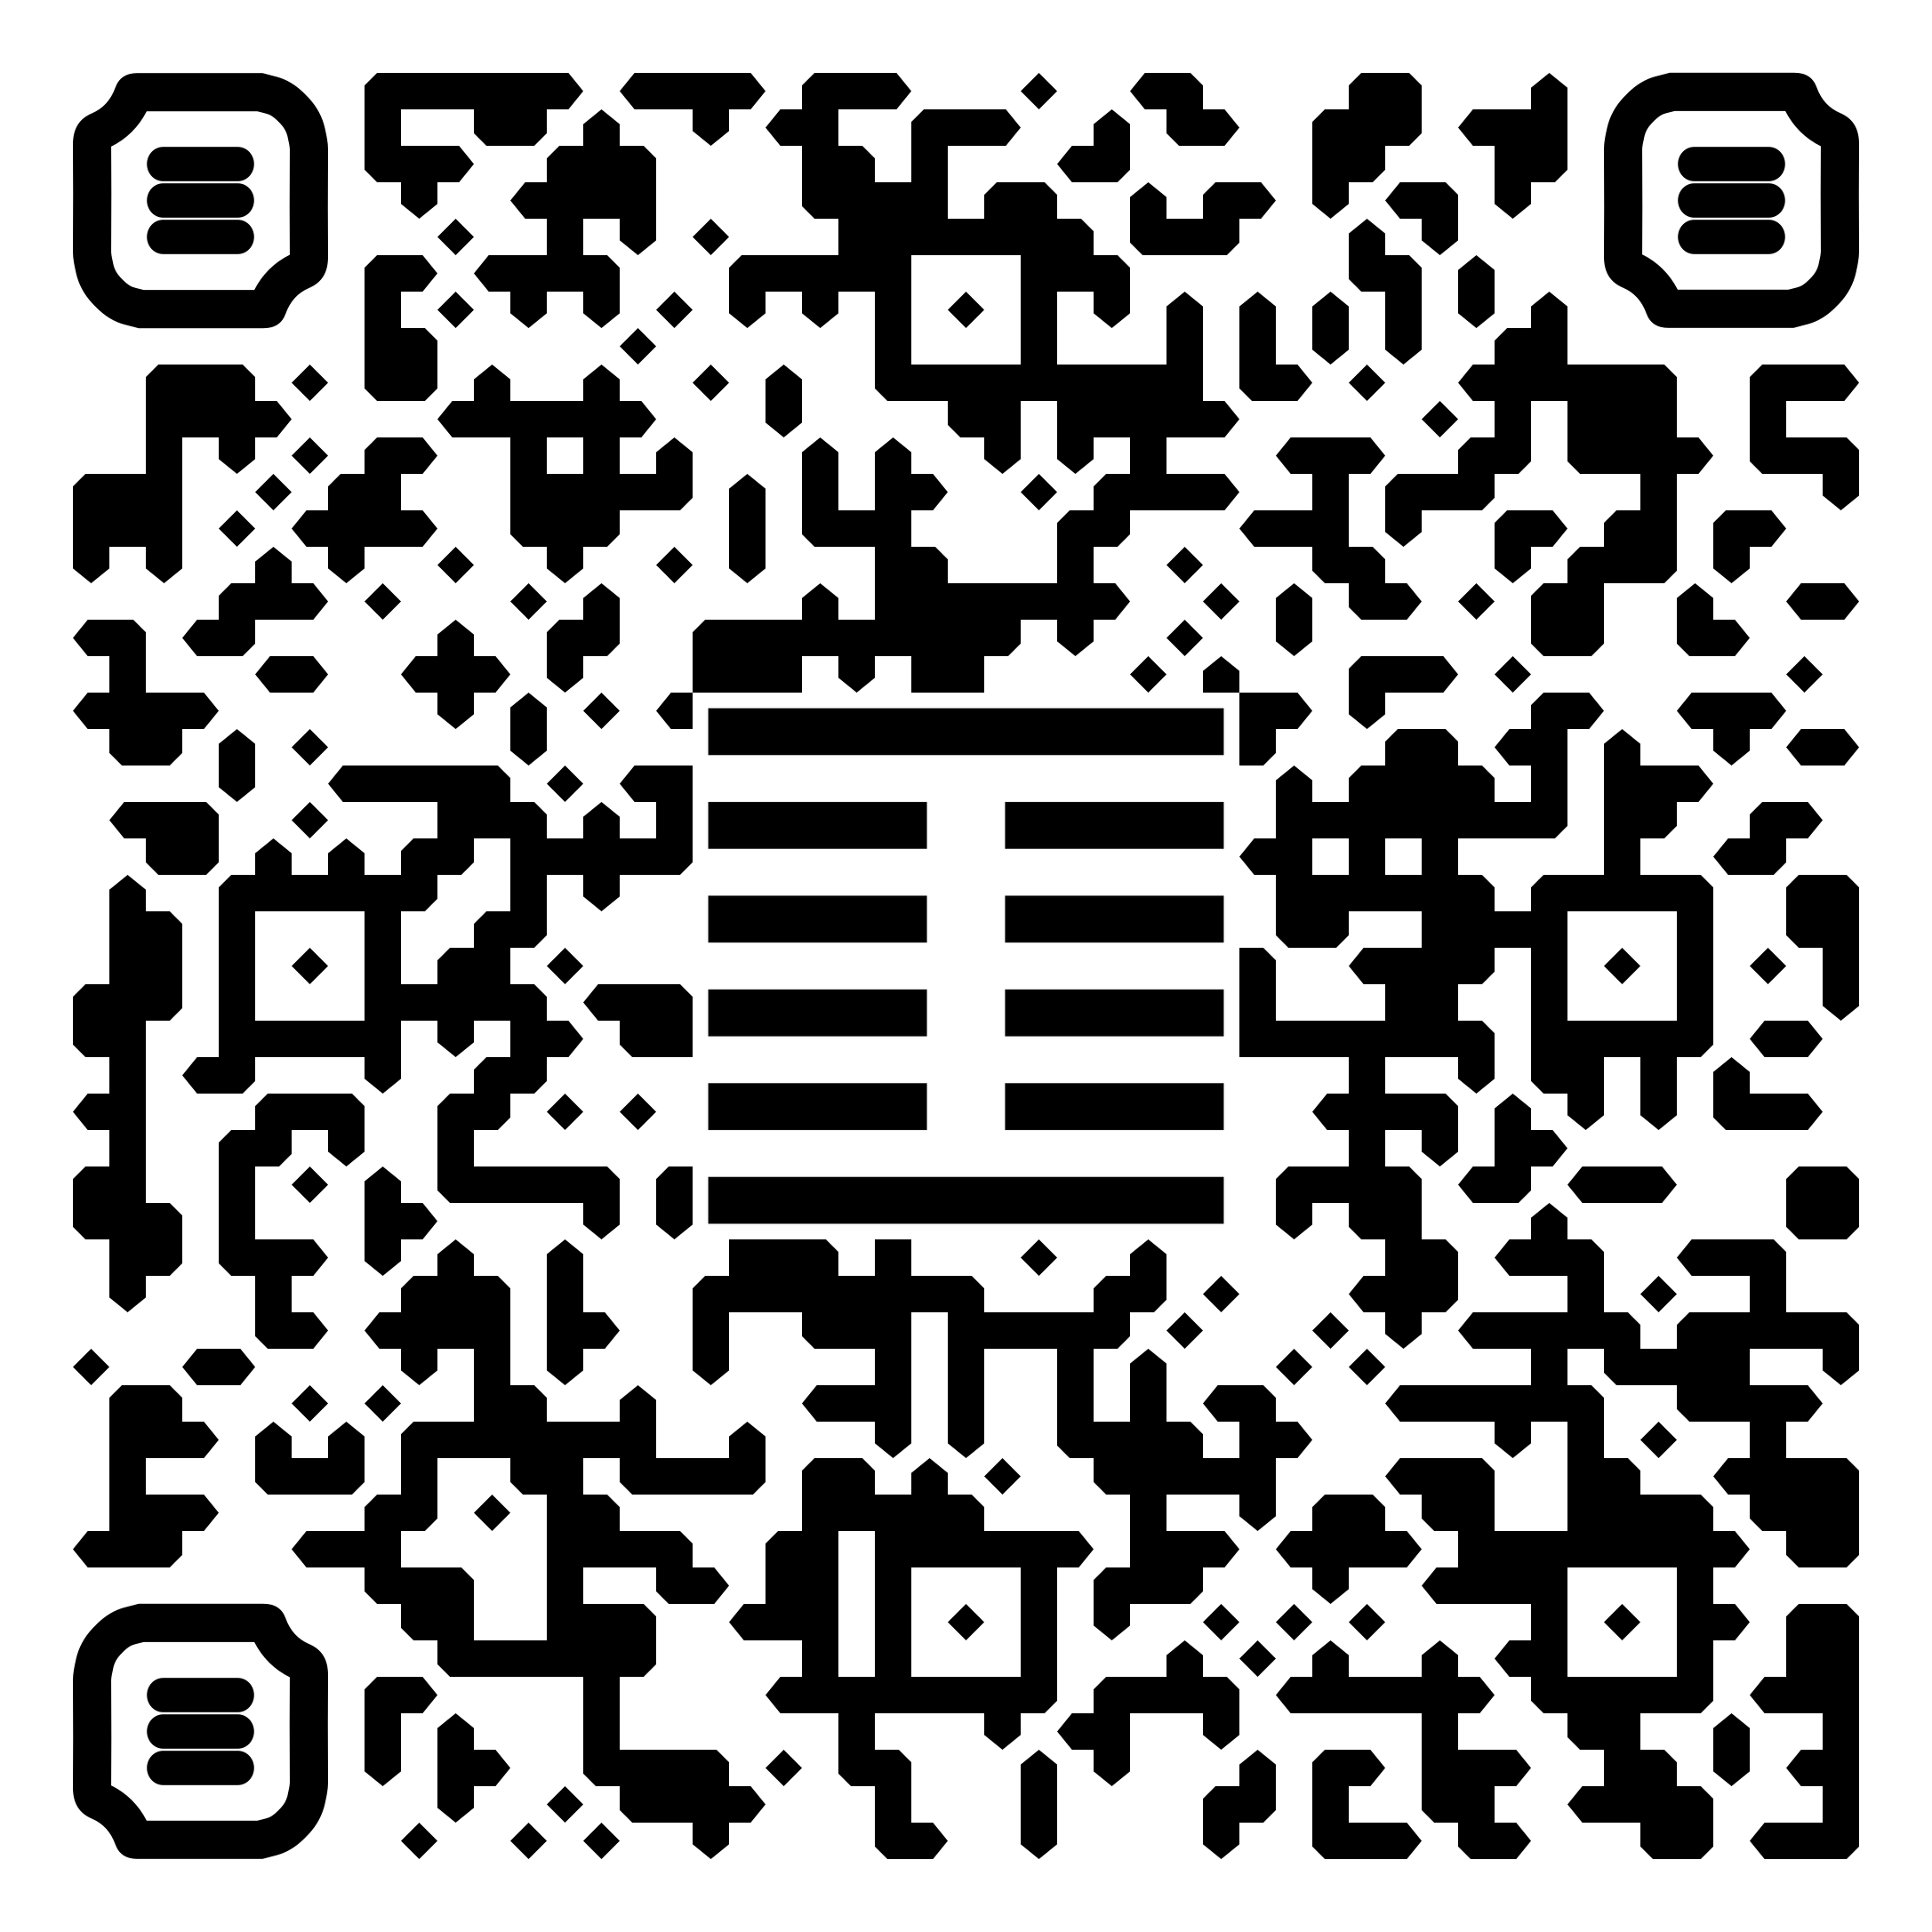 qr-code-27.png